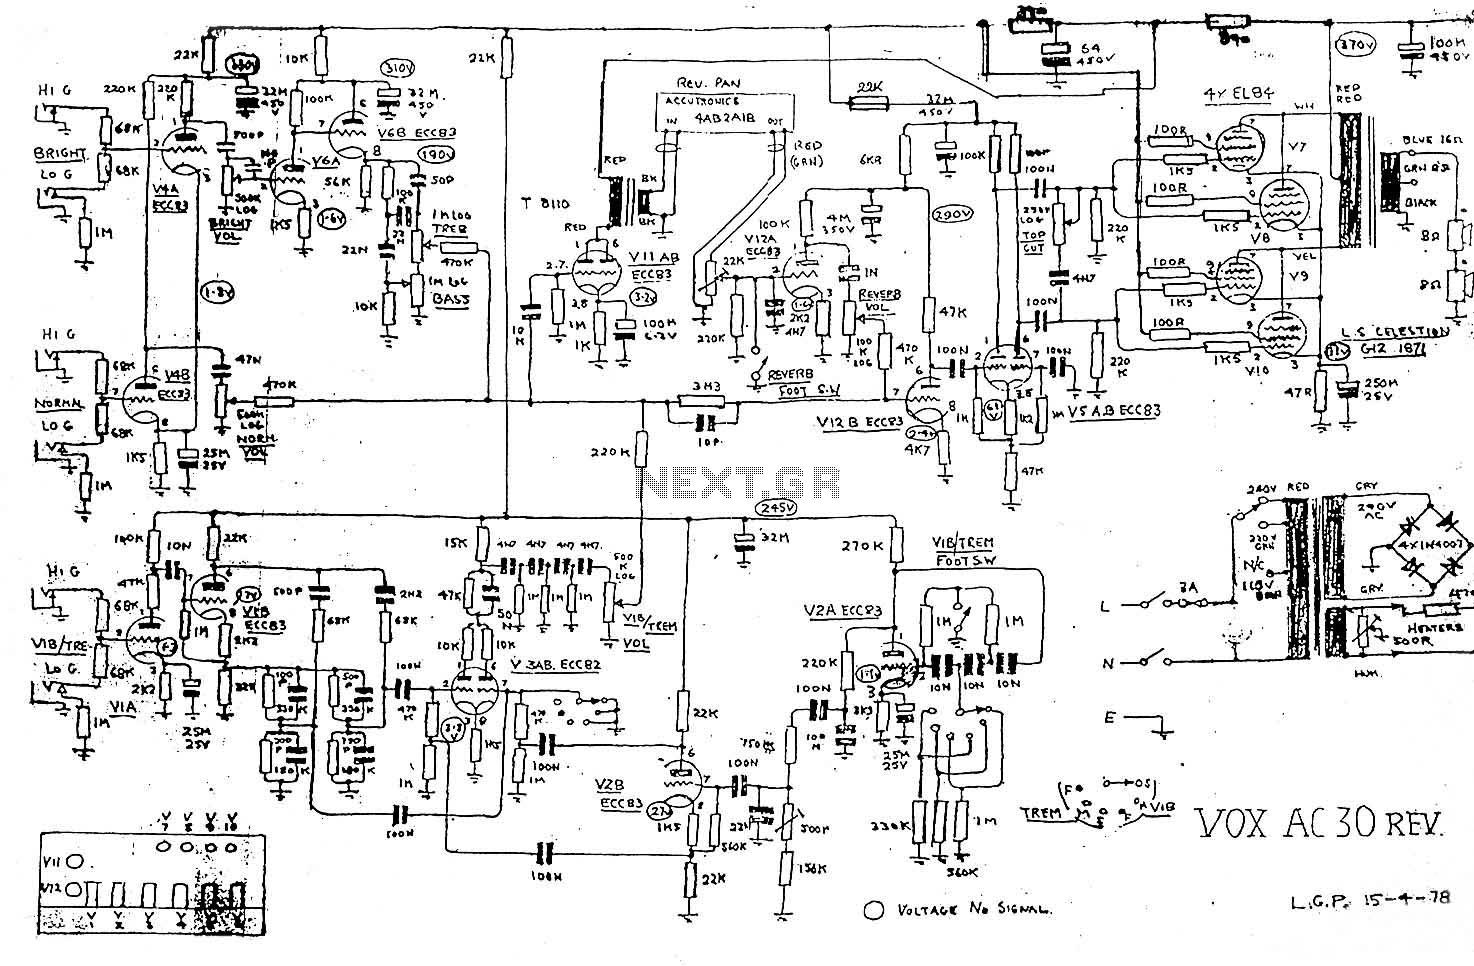 u0026gt  rf  u0026gt  antennas  u0026gt  active antennas  u0026gt  active antenna circuit for 10khz to 100mhz l11716